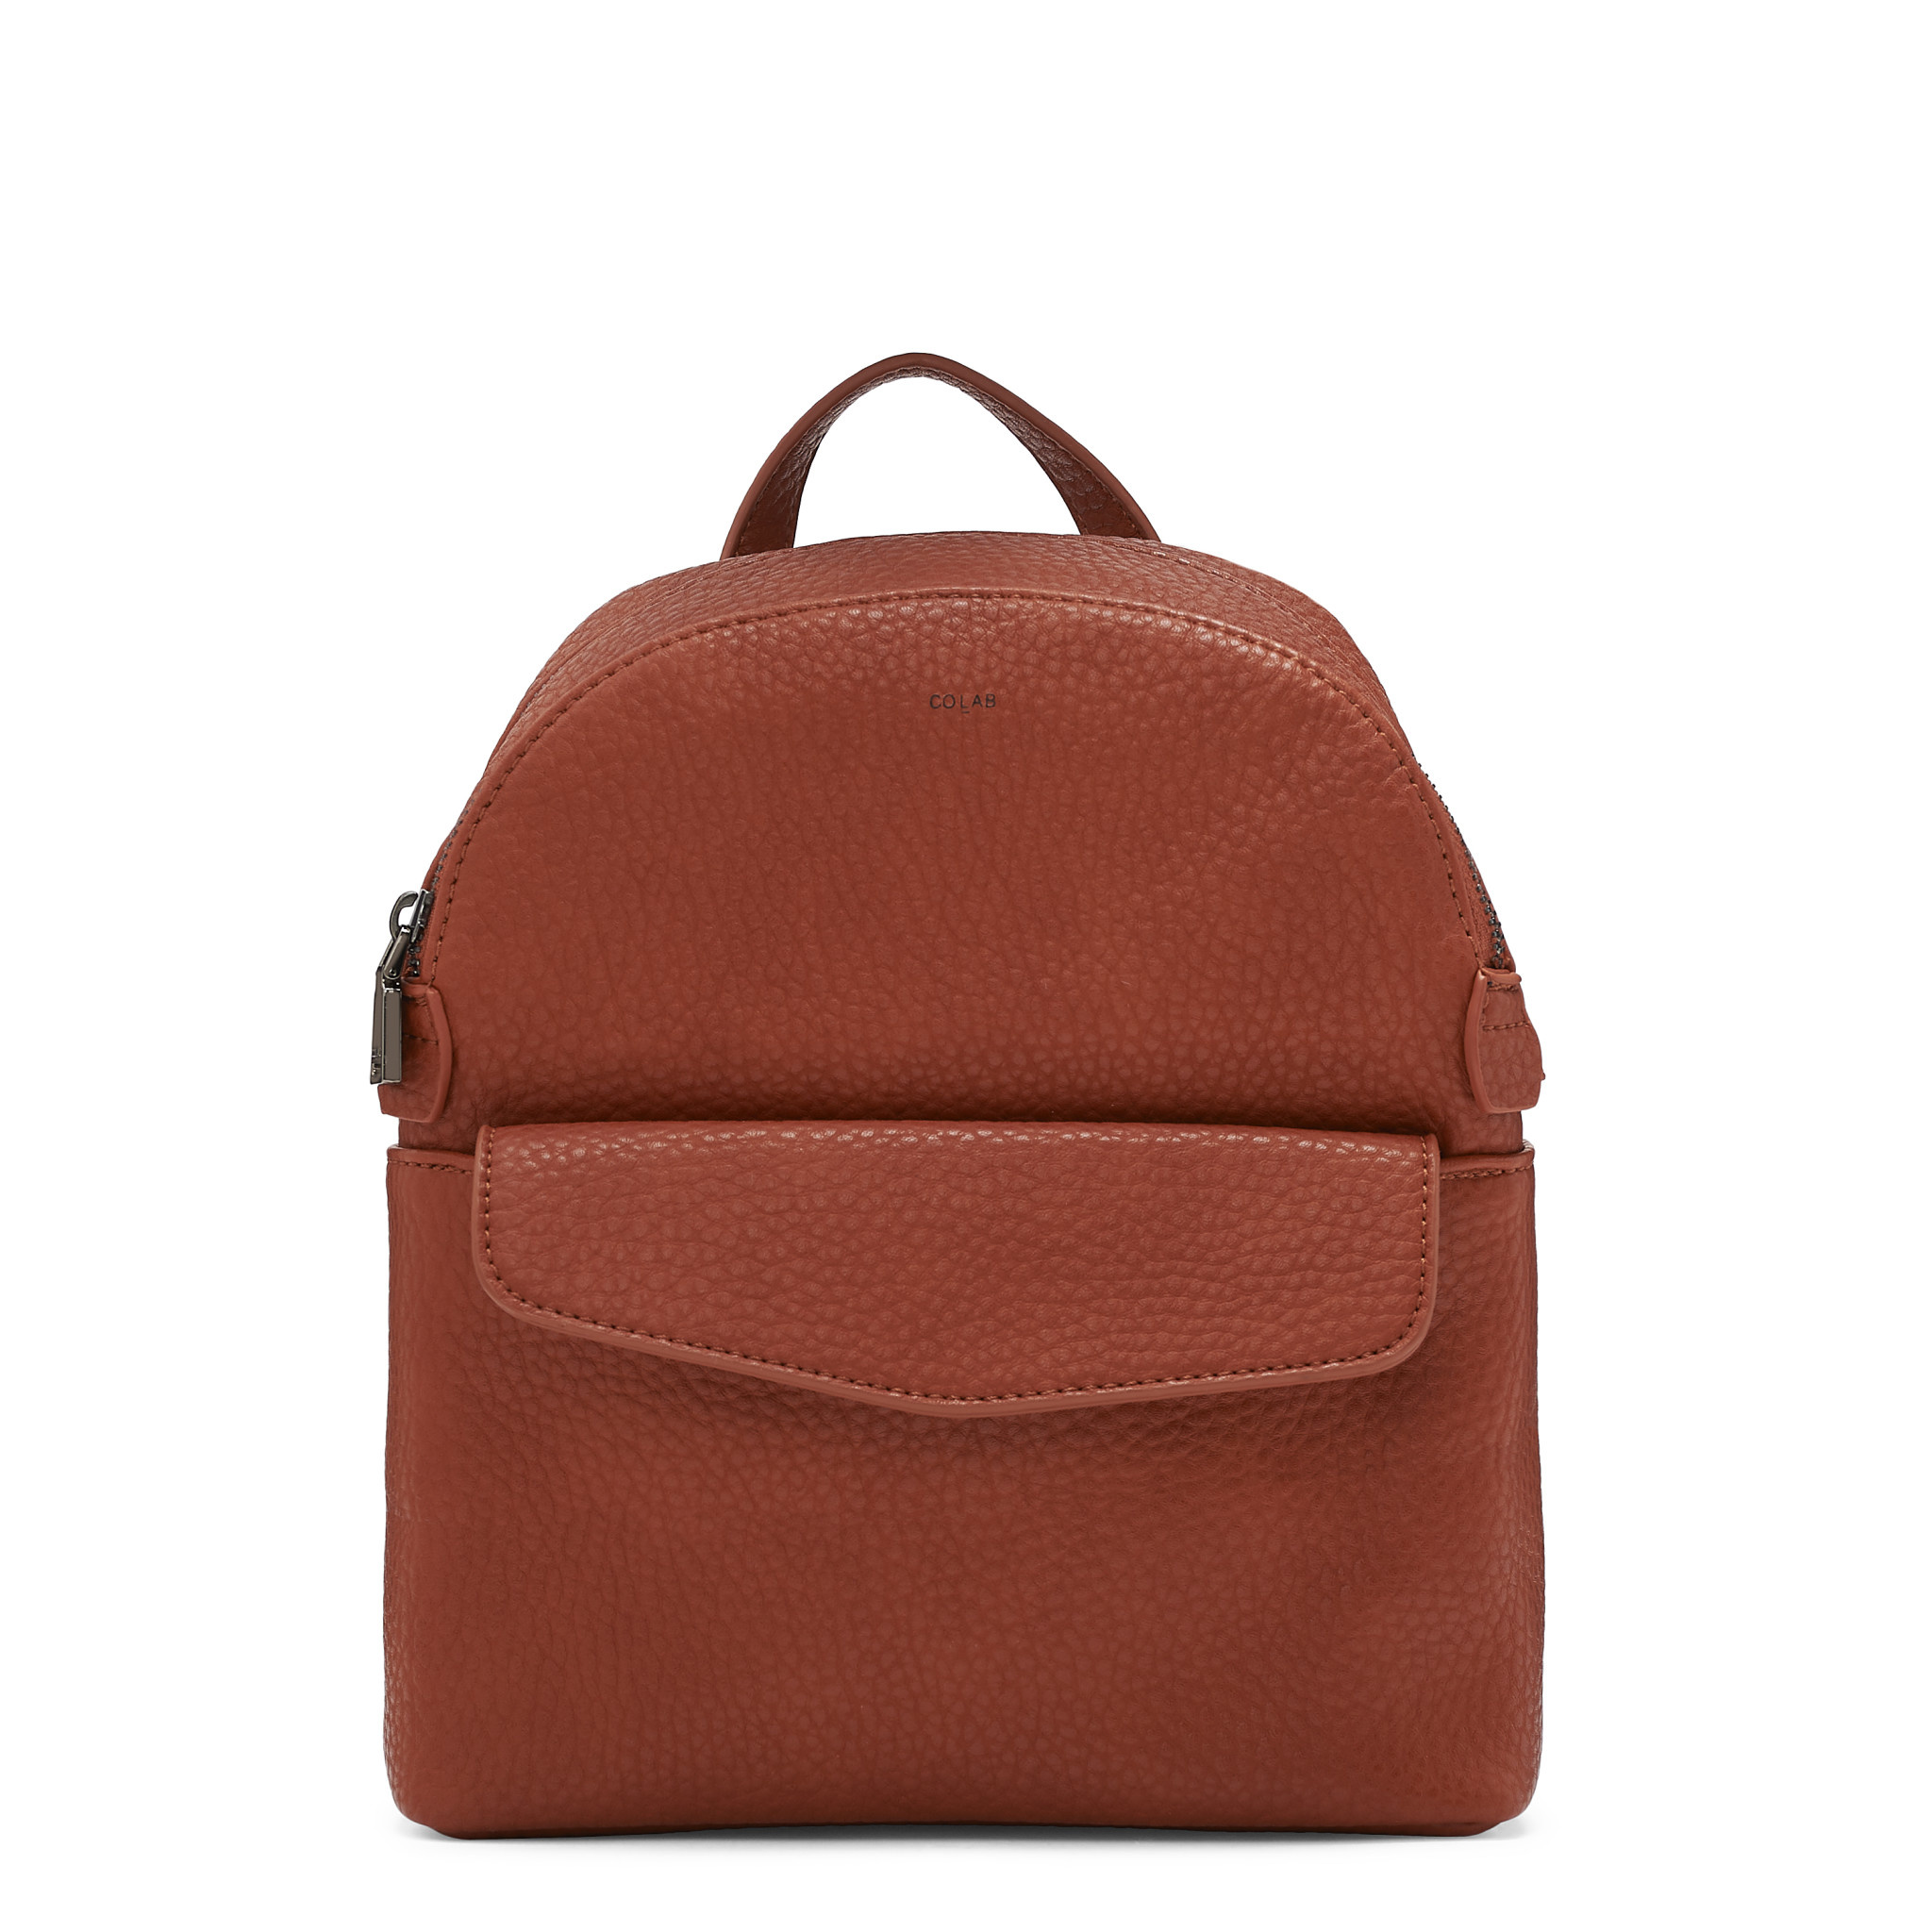 Colab Colab Pebble P.U. Mini Backpack (#6336) - Pumpkin